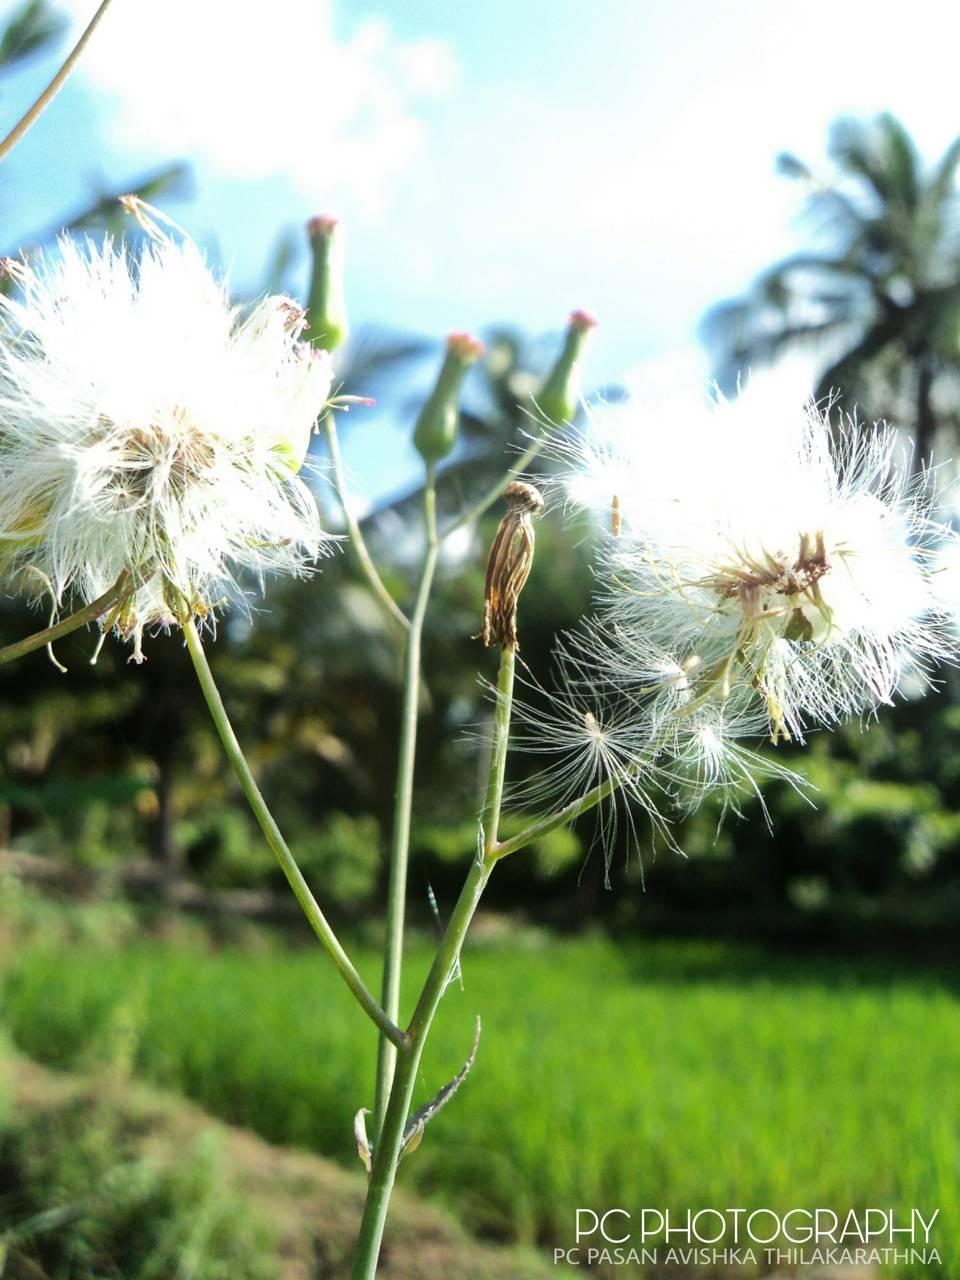 Pc mpnarakudumbiya